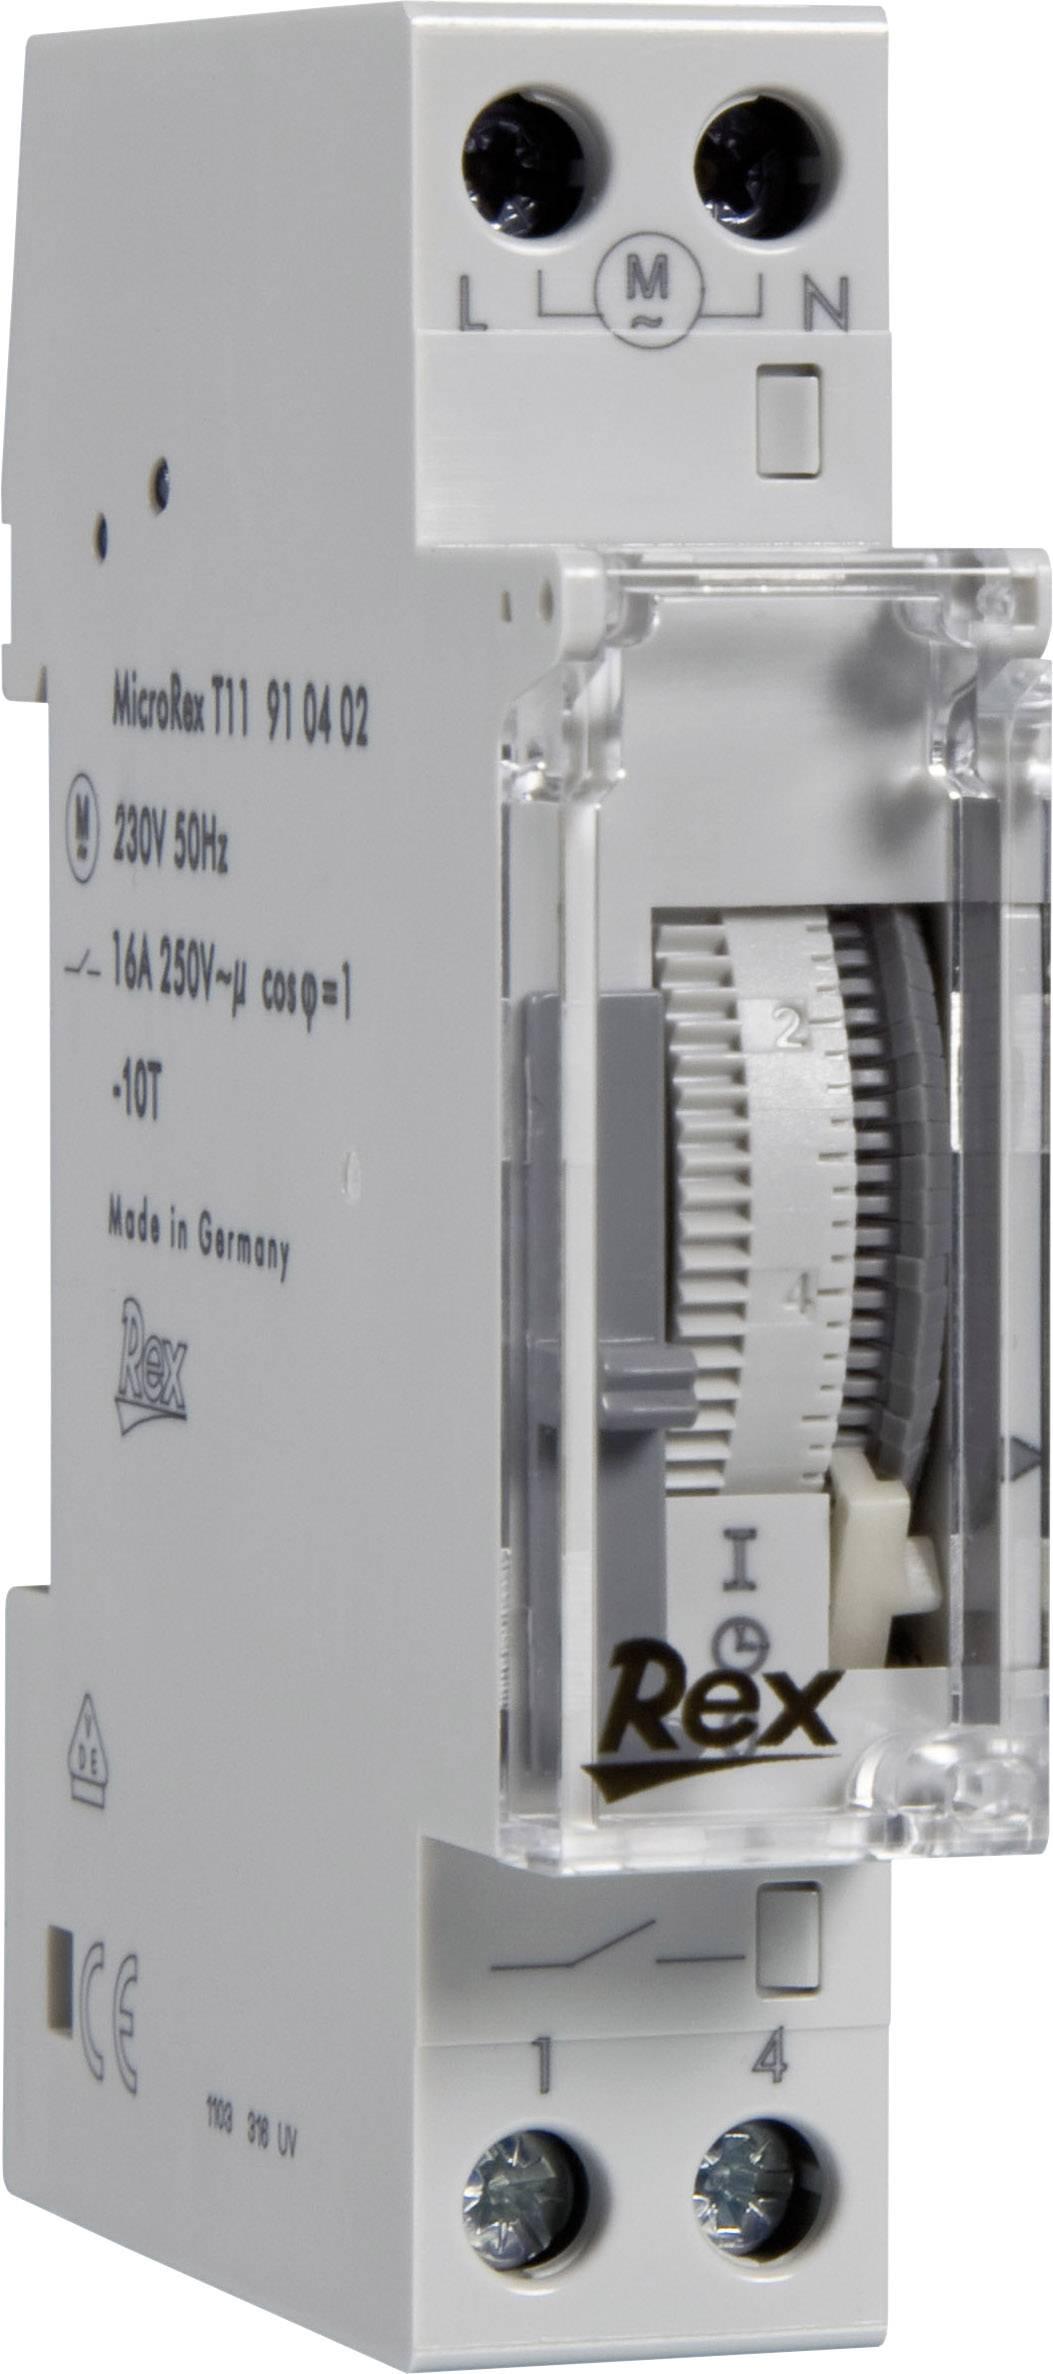 din rail mount timer rex zeitschaltuhren 916402 230 v from conrad com rh conrad com Le Grand Switch Magnesium Electric Timer Switch